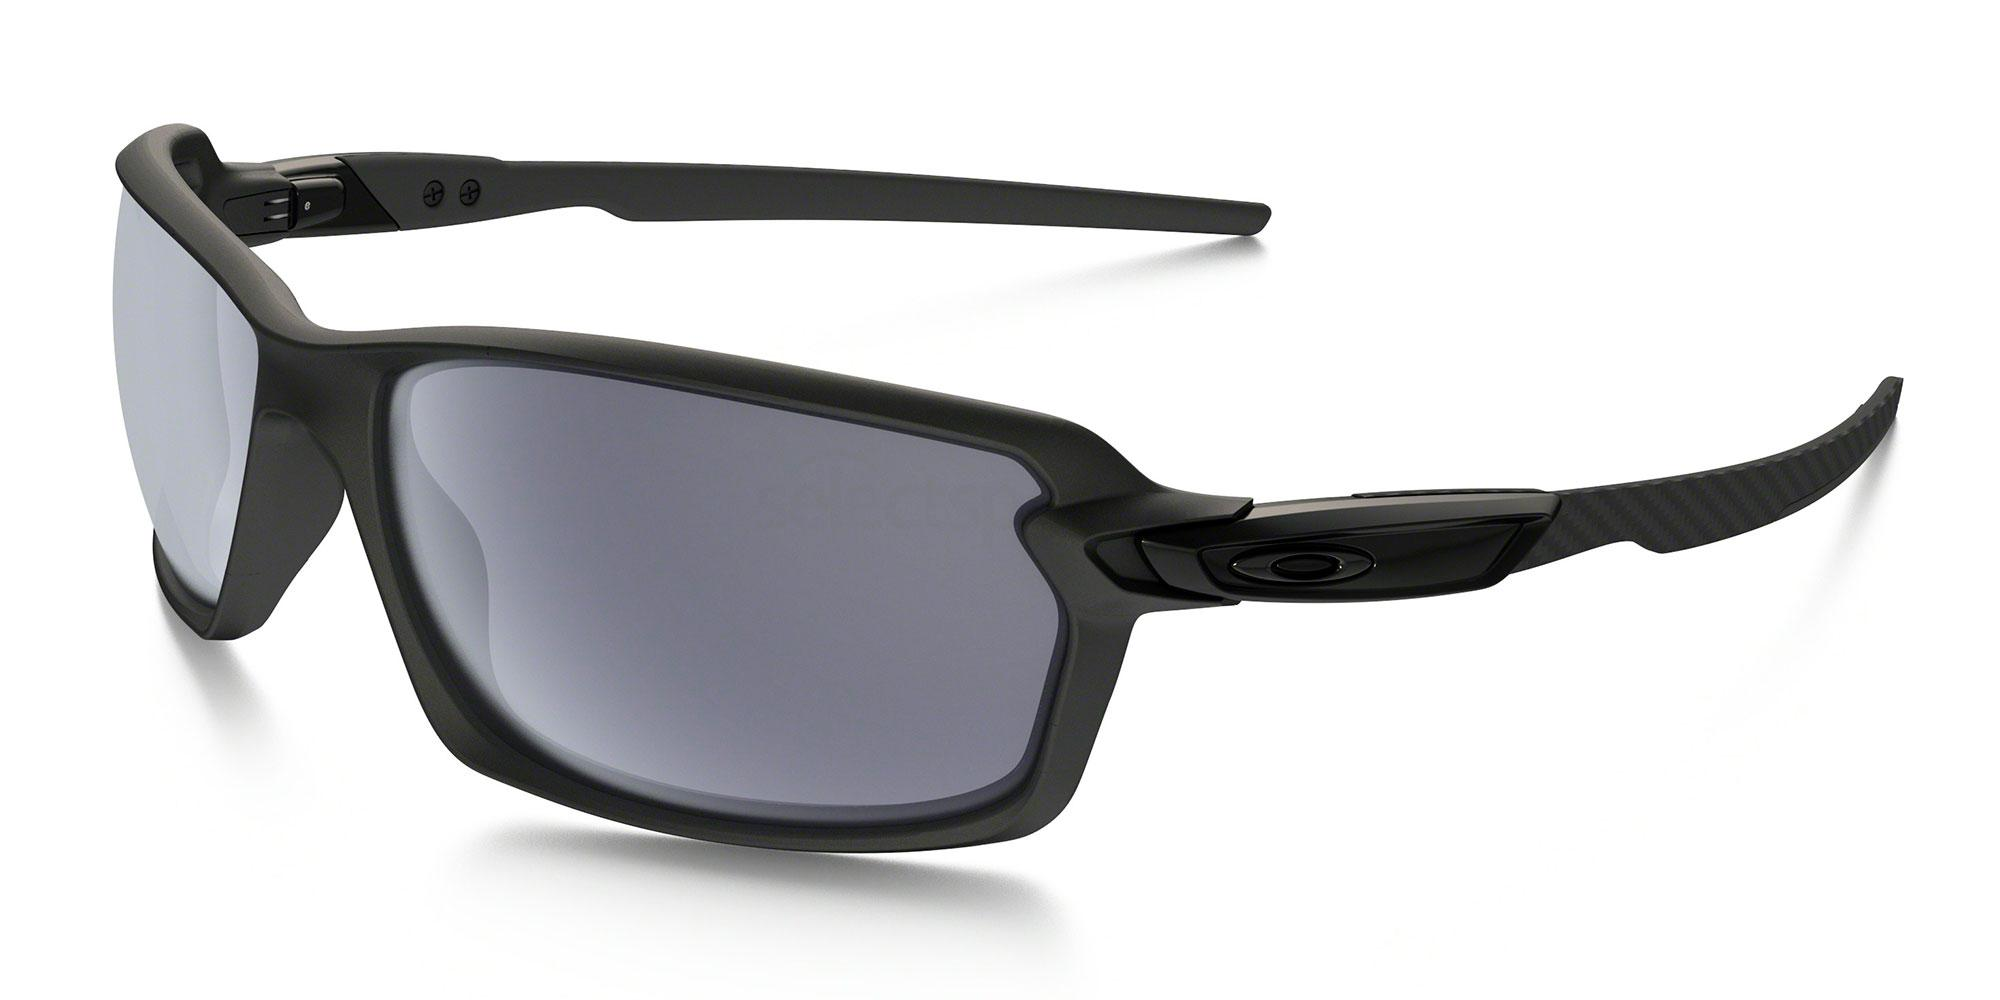 930201 OO9302 CARBON SHIFT Sunglasses, Oakley